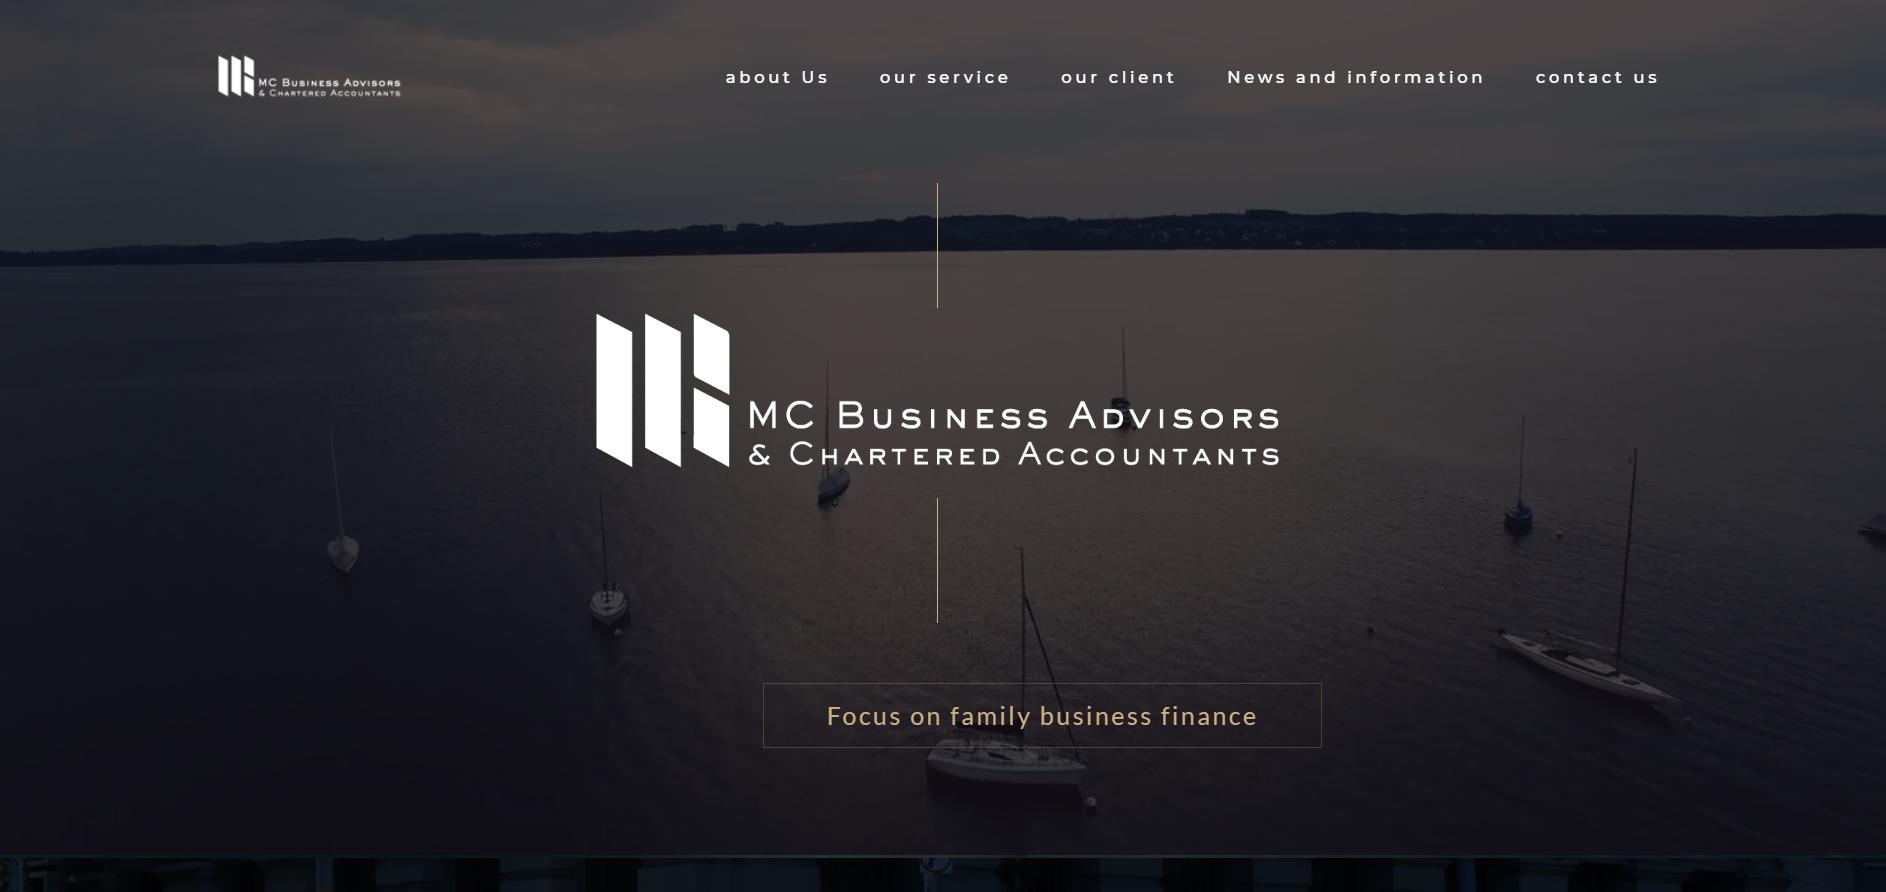 Mc Business Advisors